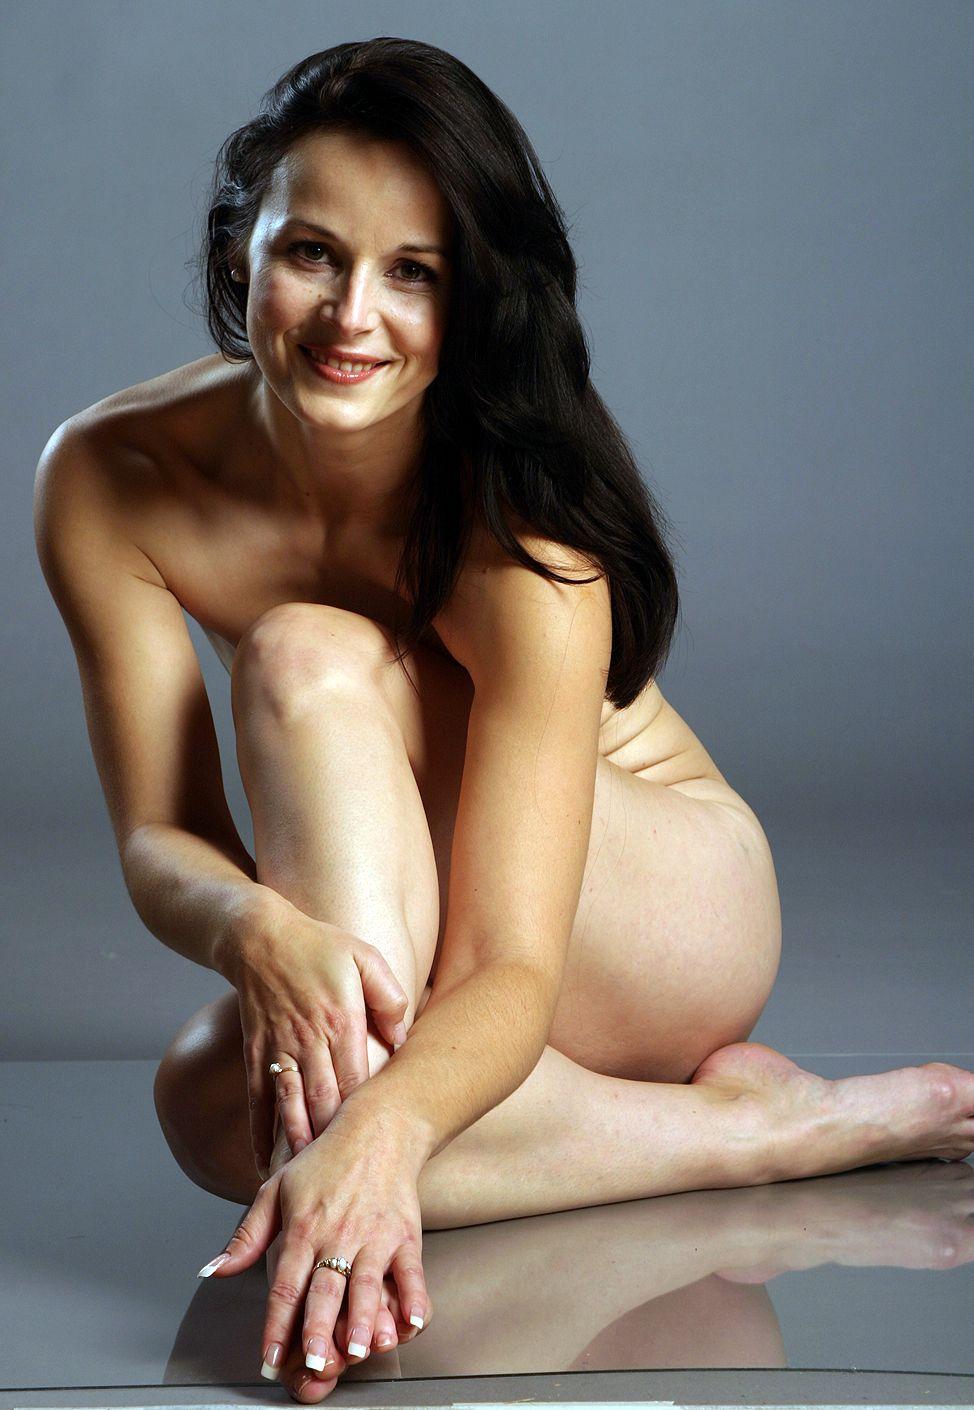 Transvestite massage sex video